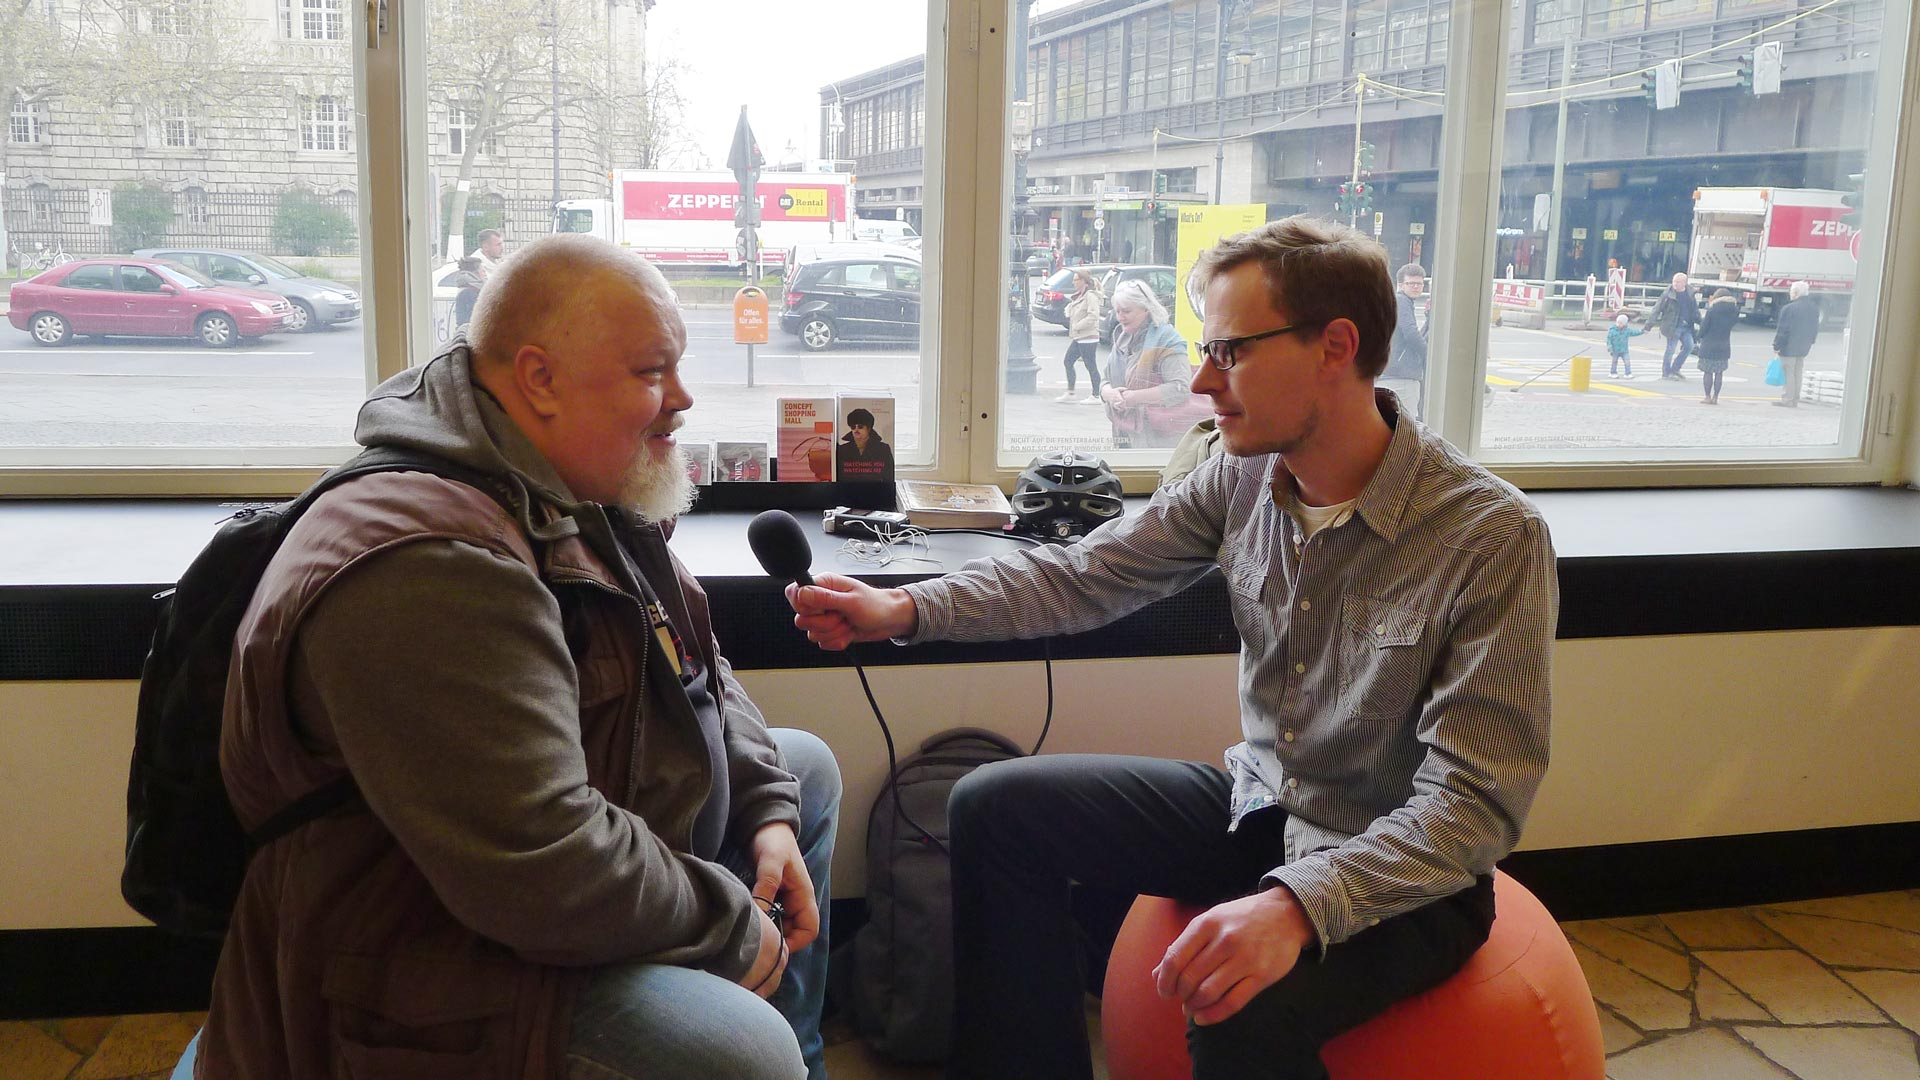 5 juli-podden 49: Watched på C/O Berlin. Henrik Alexandersson (HAX) och Karl Andersson.